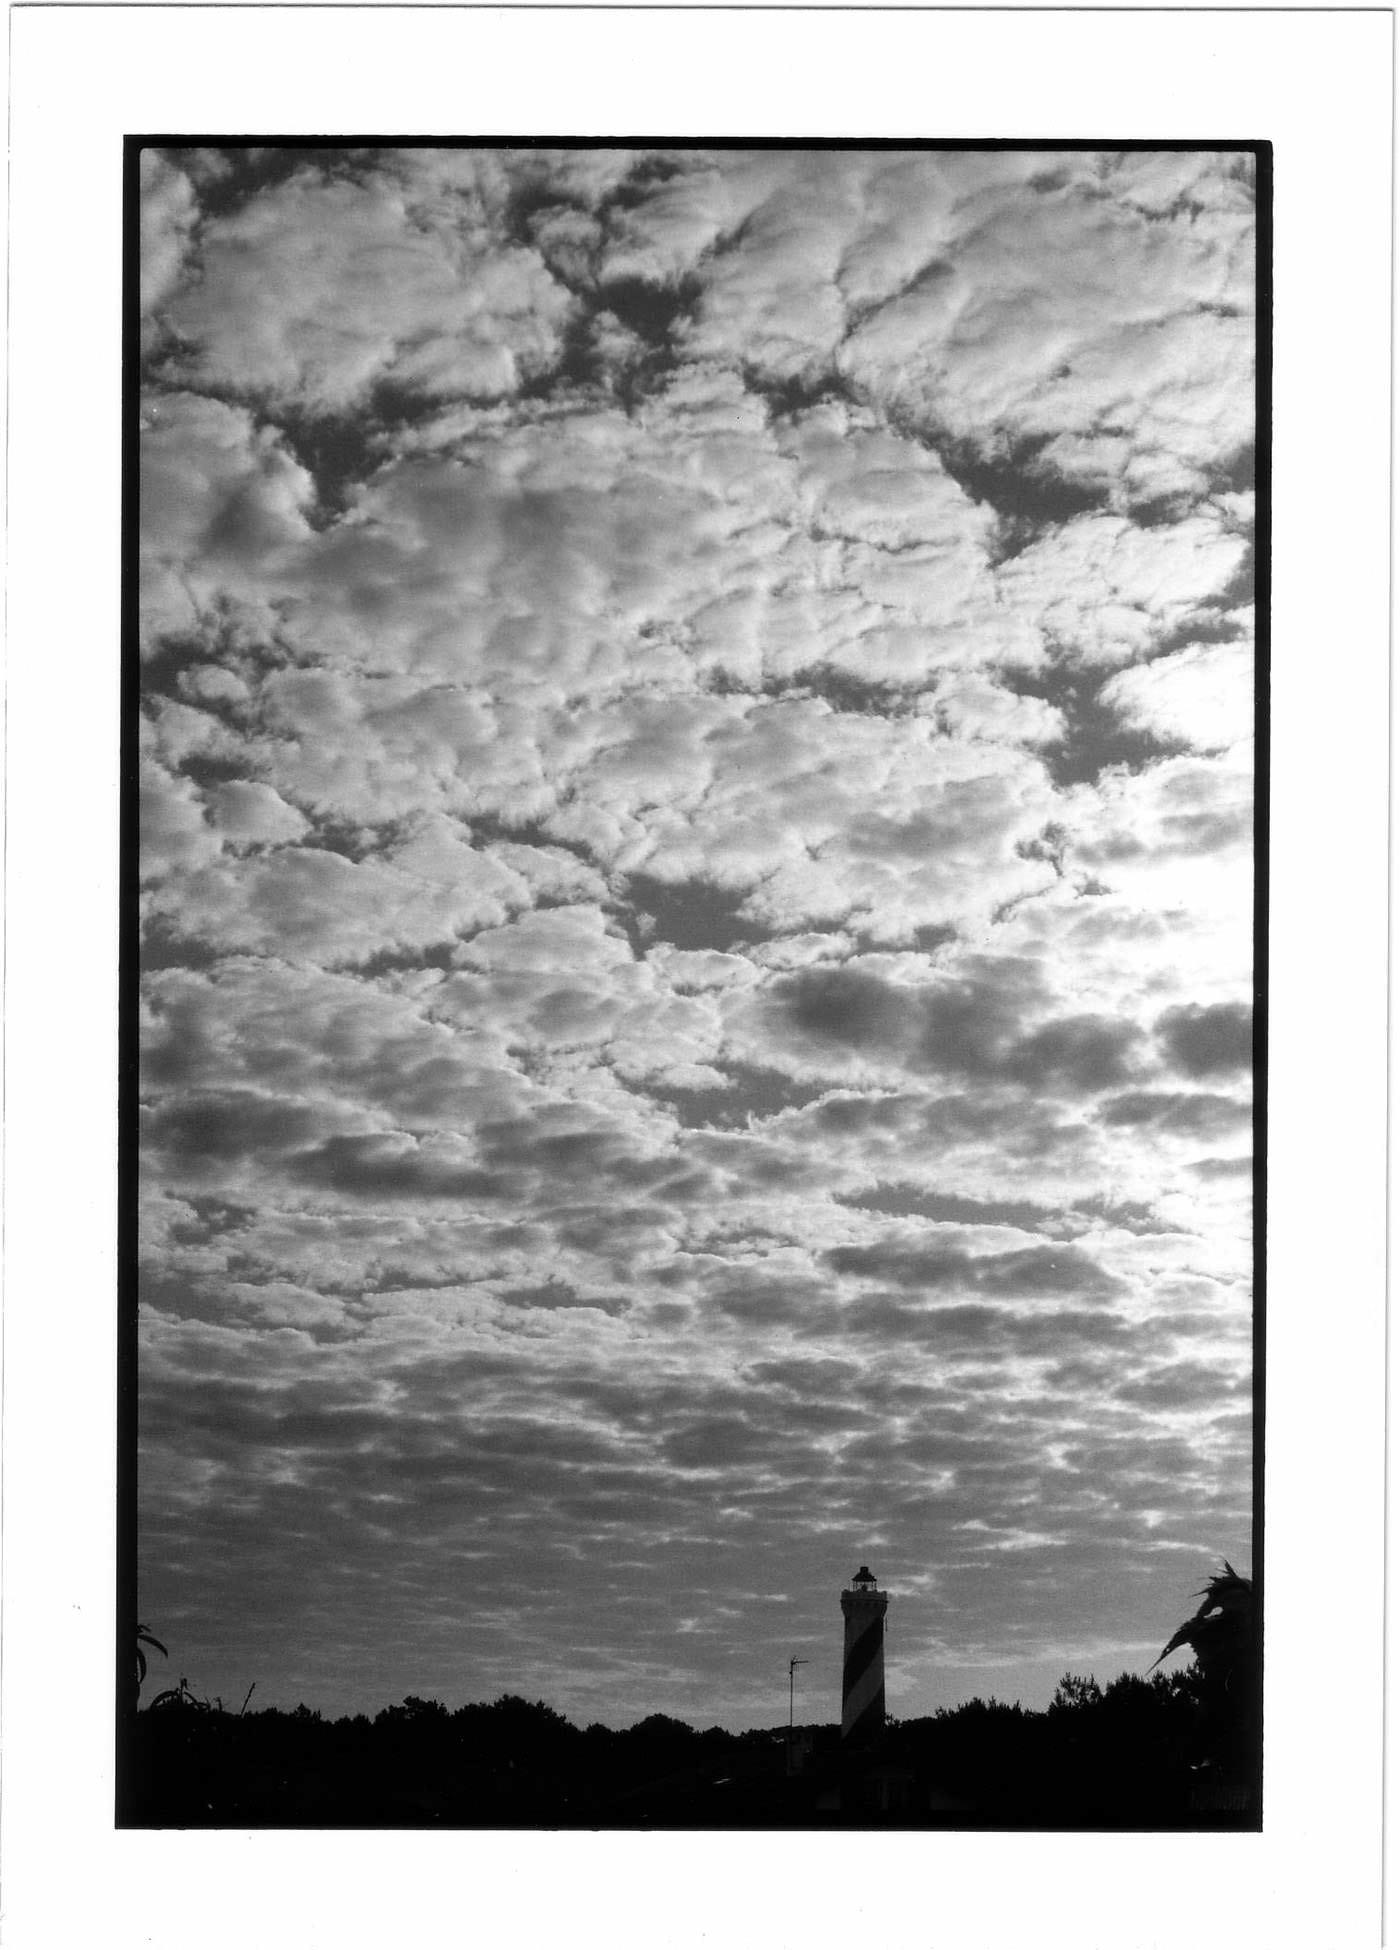 Le phare du ciel